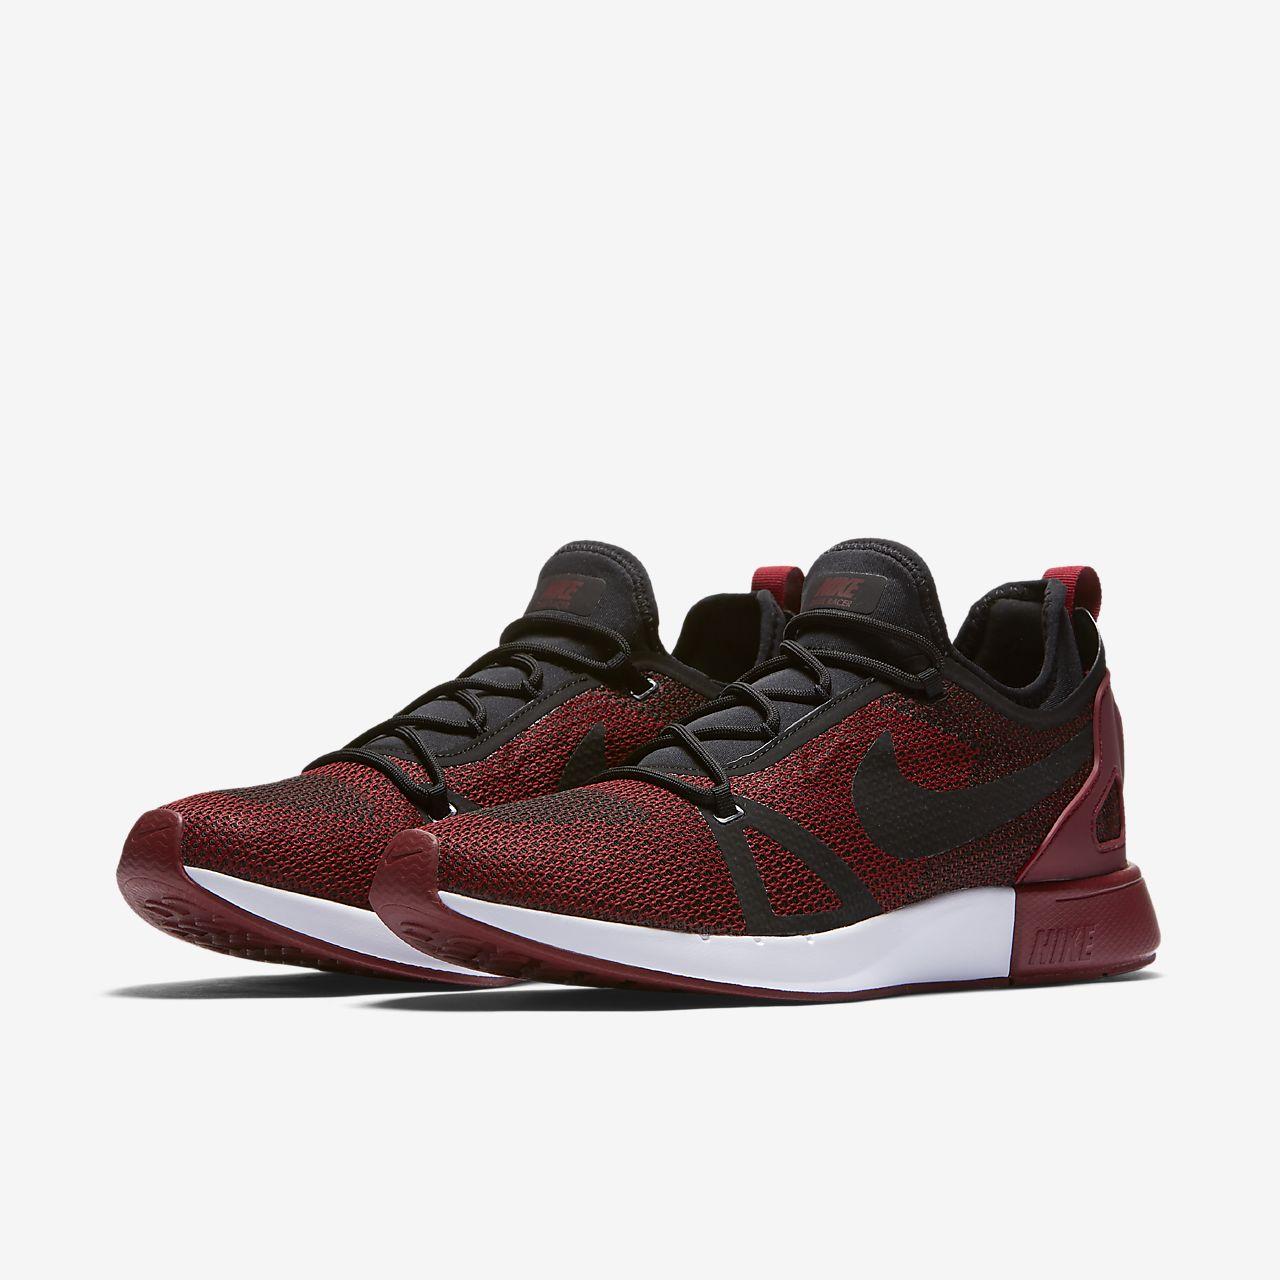 ... Nike Duel Racer Men's Shoe